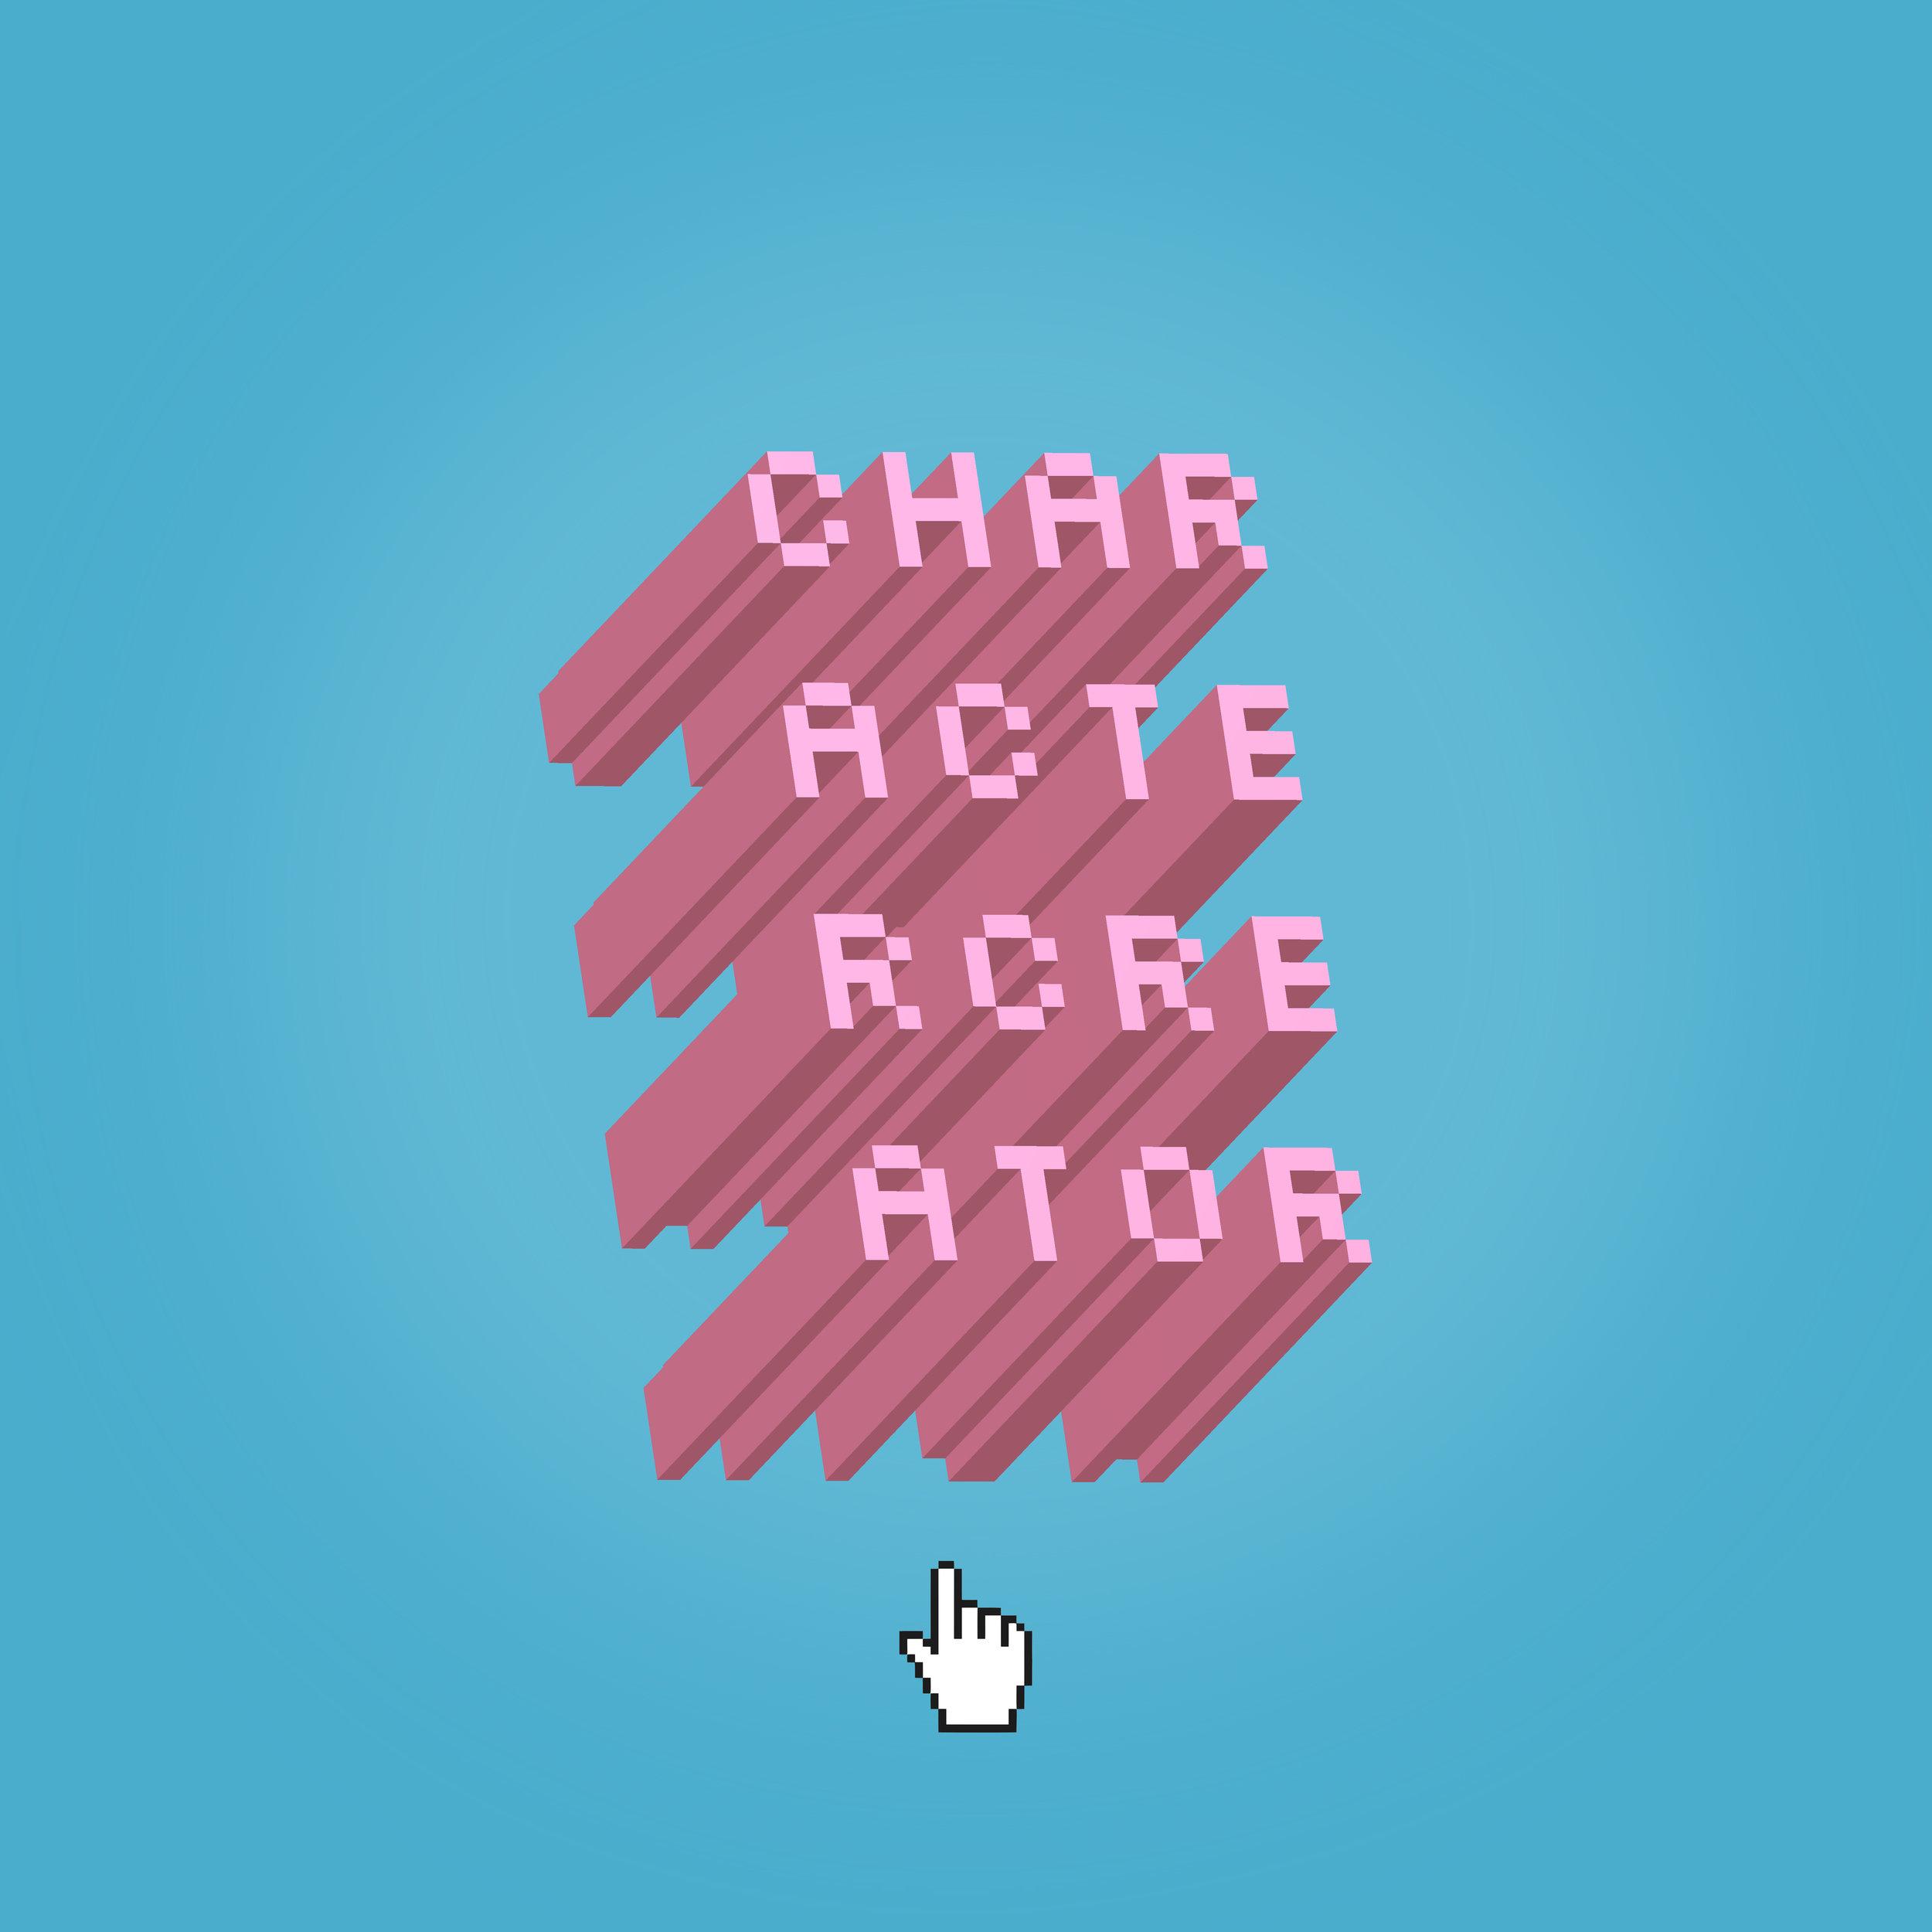 charactercreator(logo) 2.jpg